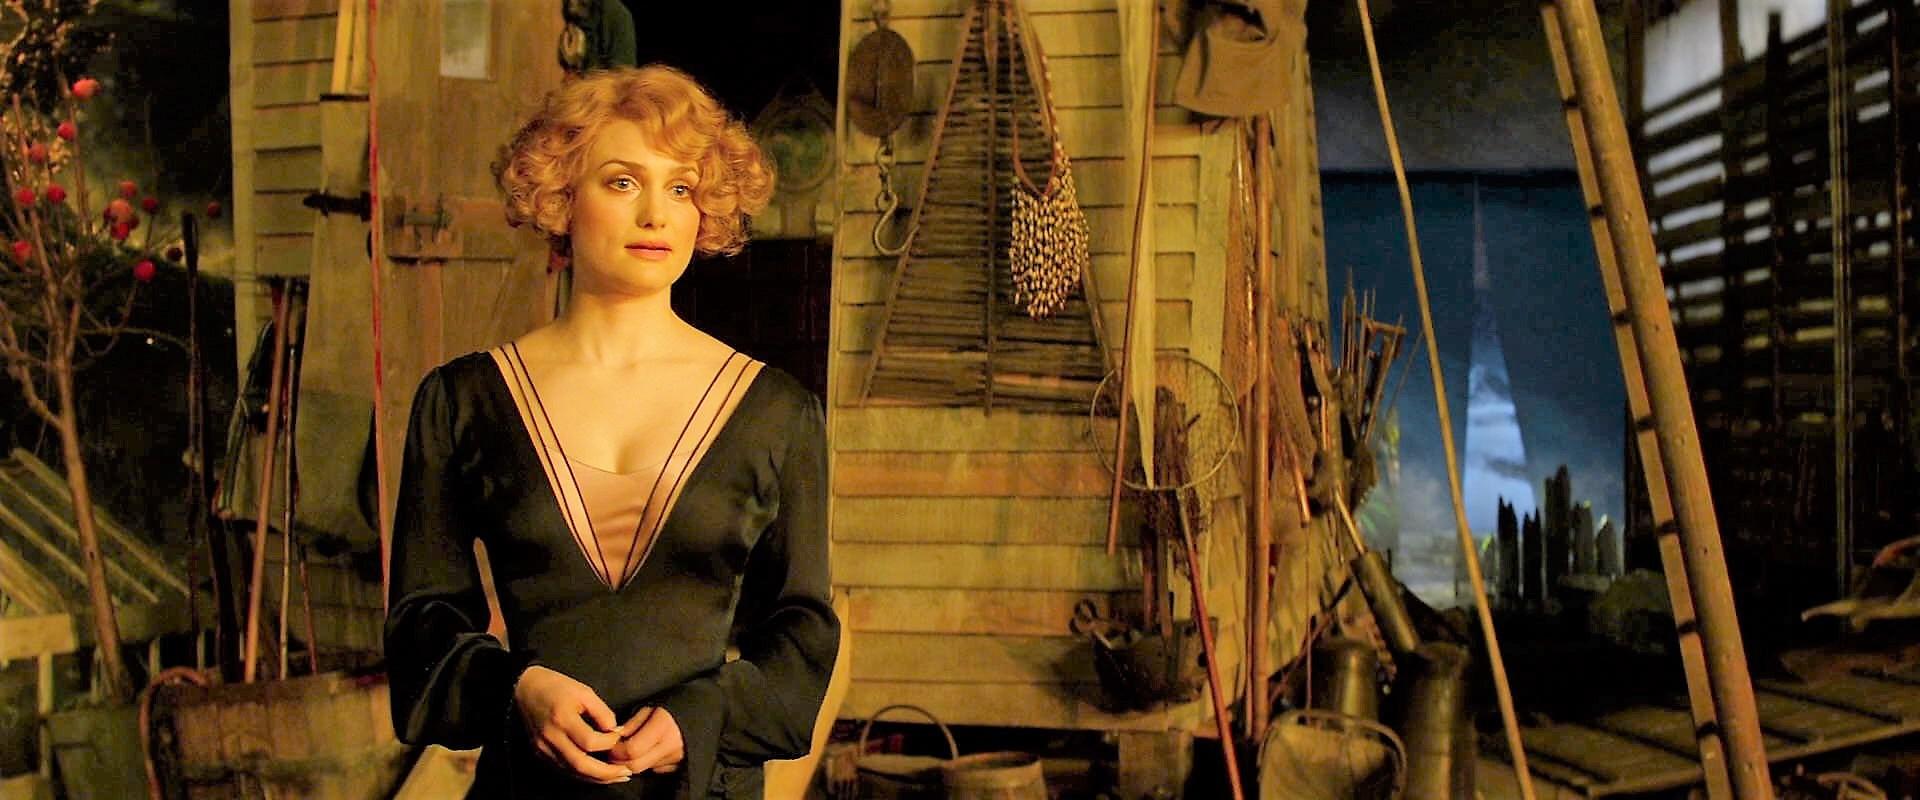 Queenie Goldstein | Harry Potter Wiki | FANDOM powered by Wikia